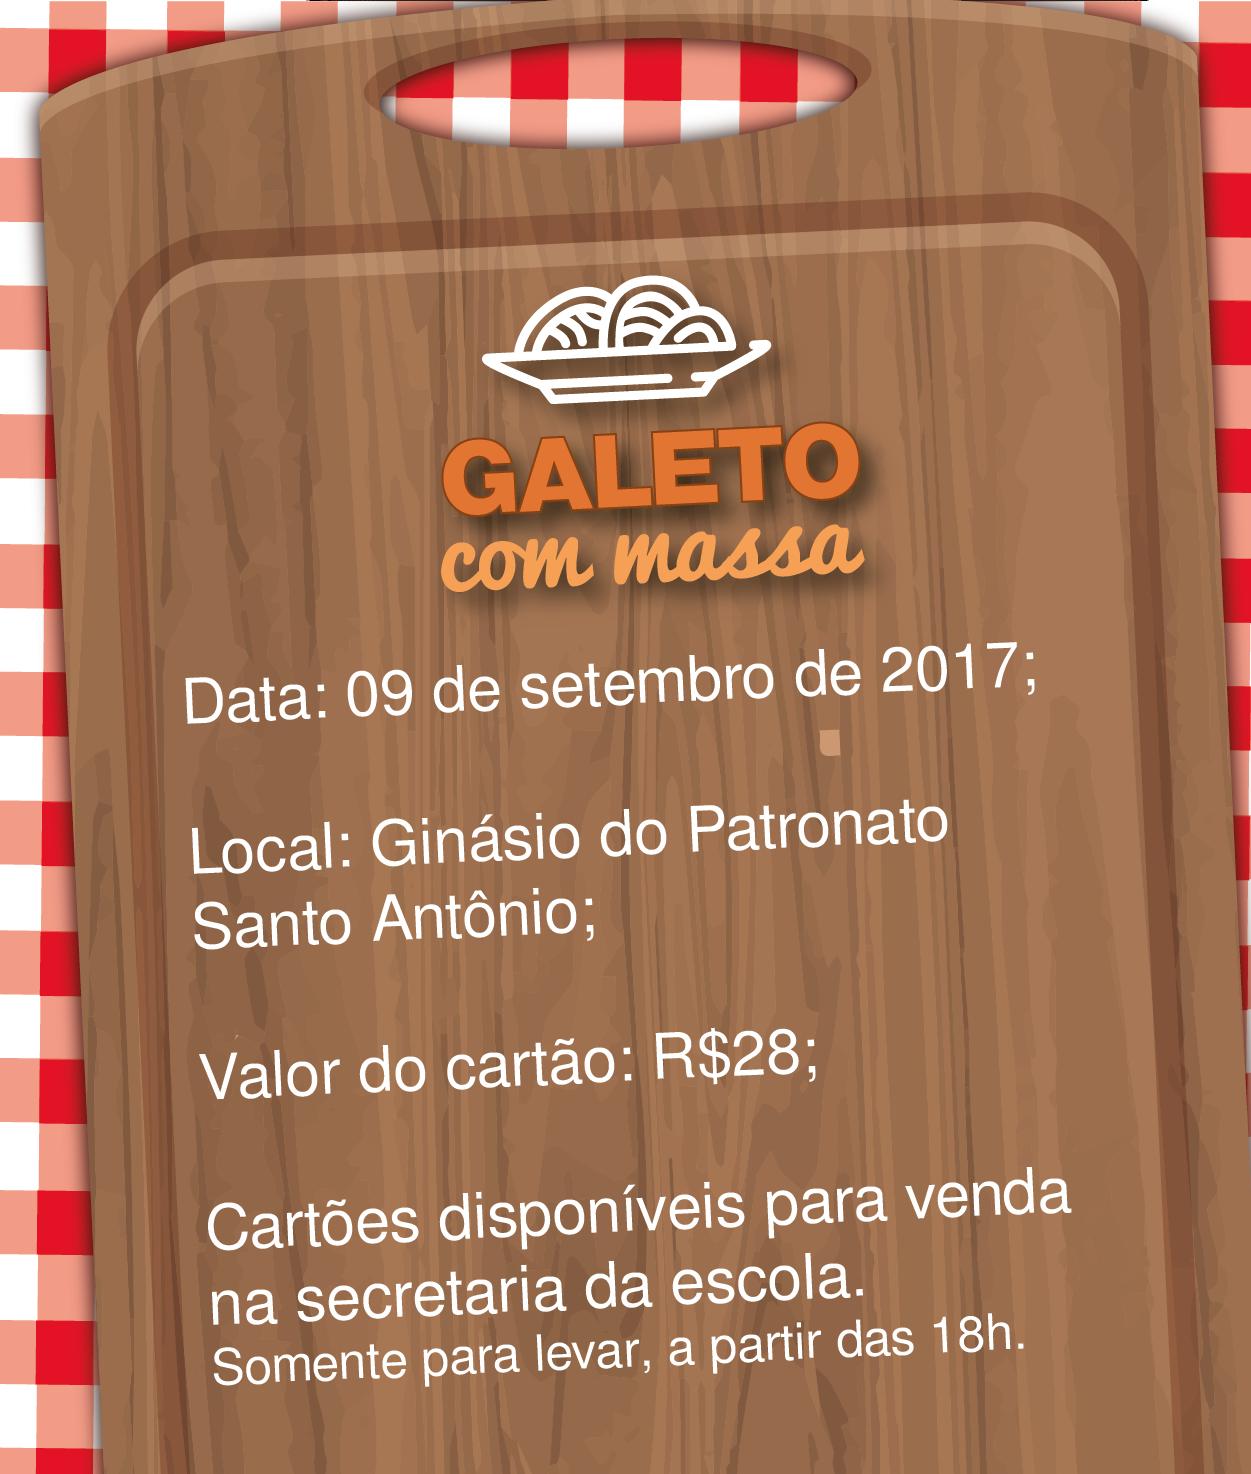 galeto com massa interno 2017-14